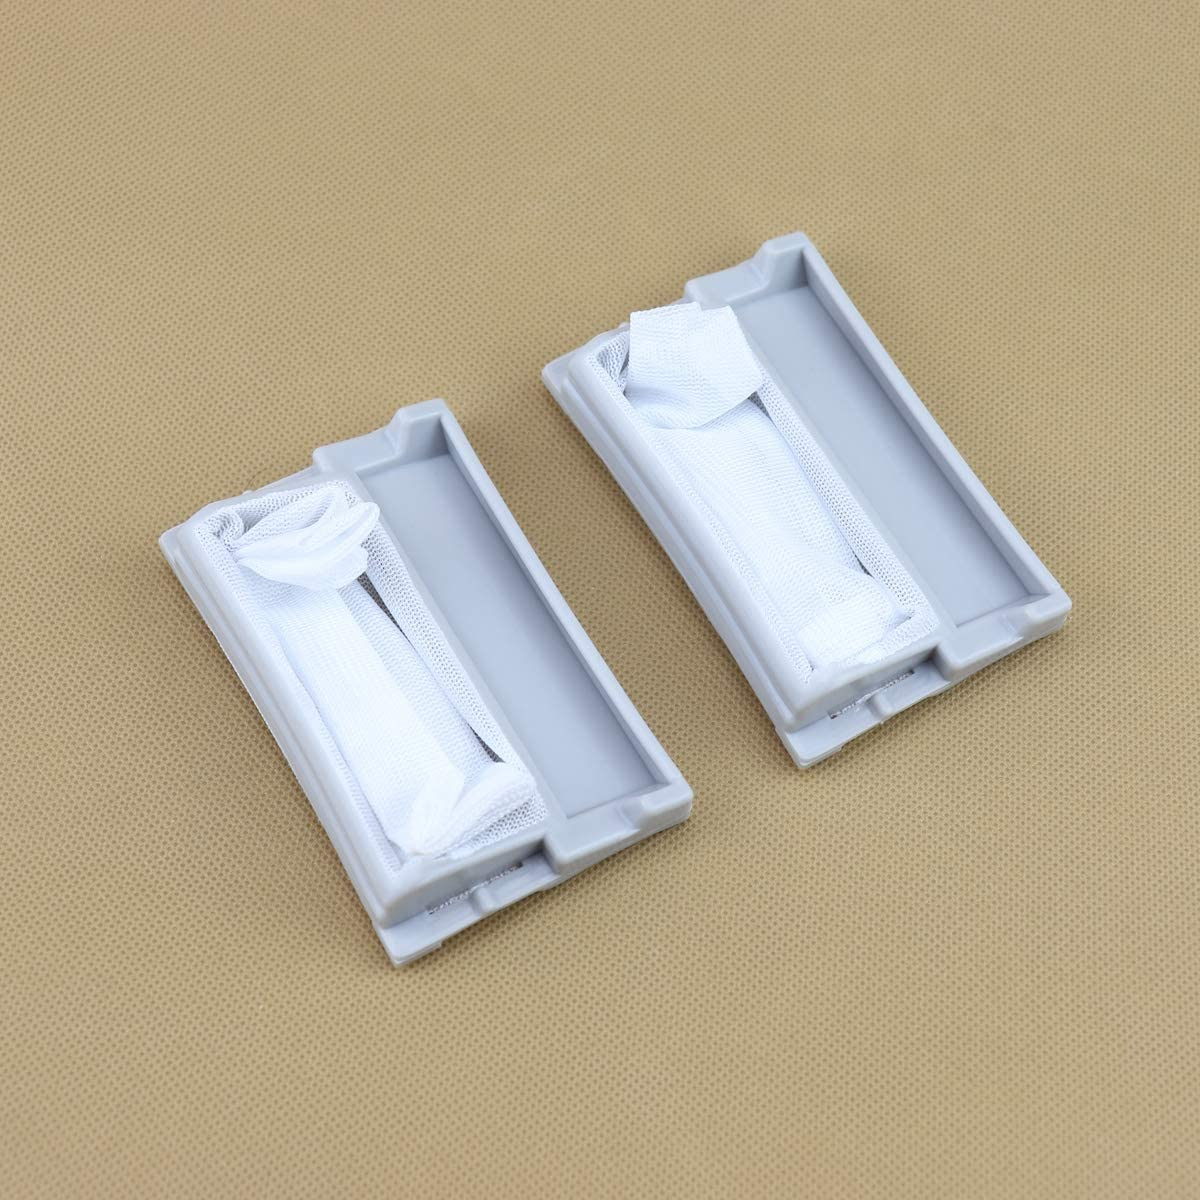 2Pcs Washing Machine Magic Lint Filter For Samsung SW50ASP、SW51ASP、SW52ASP、SW55U